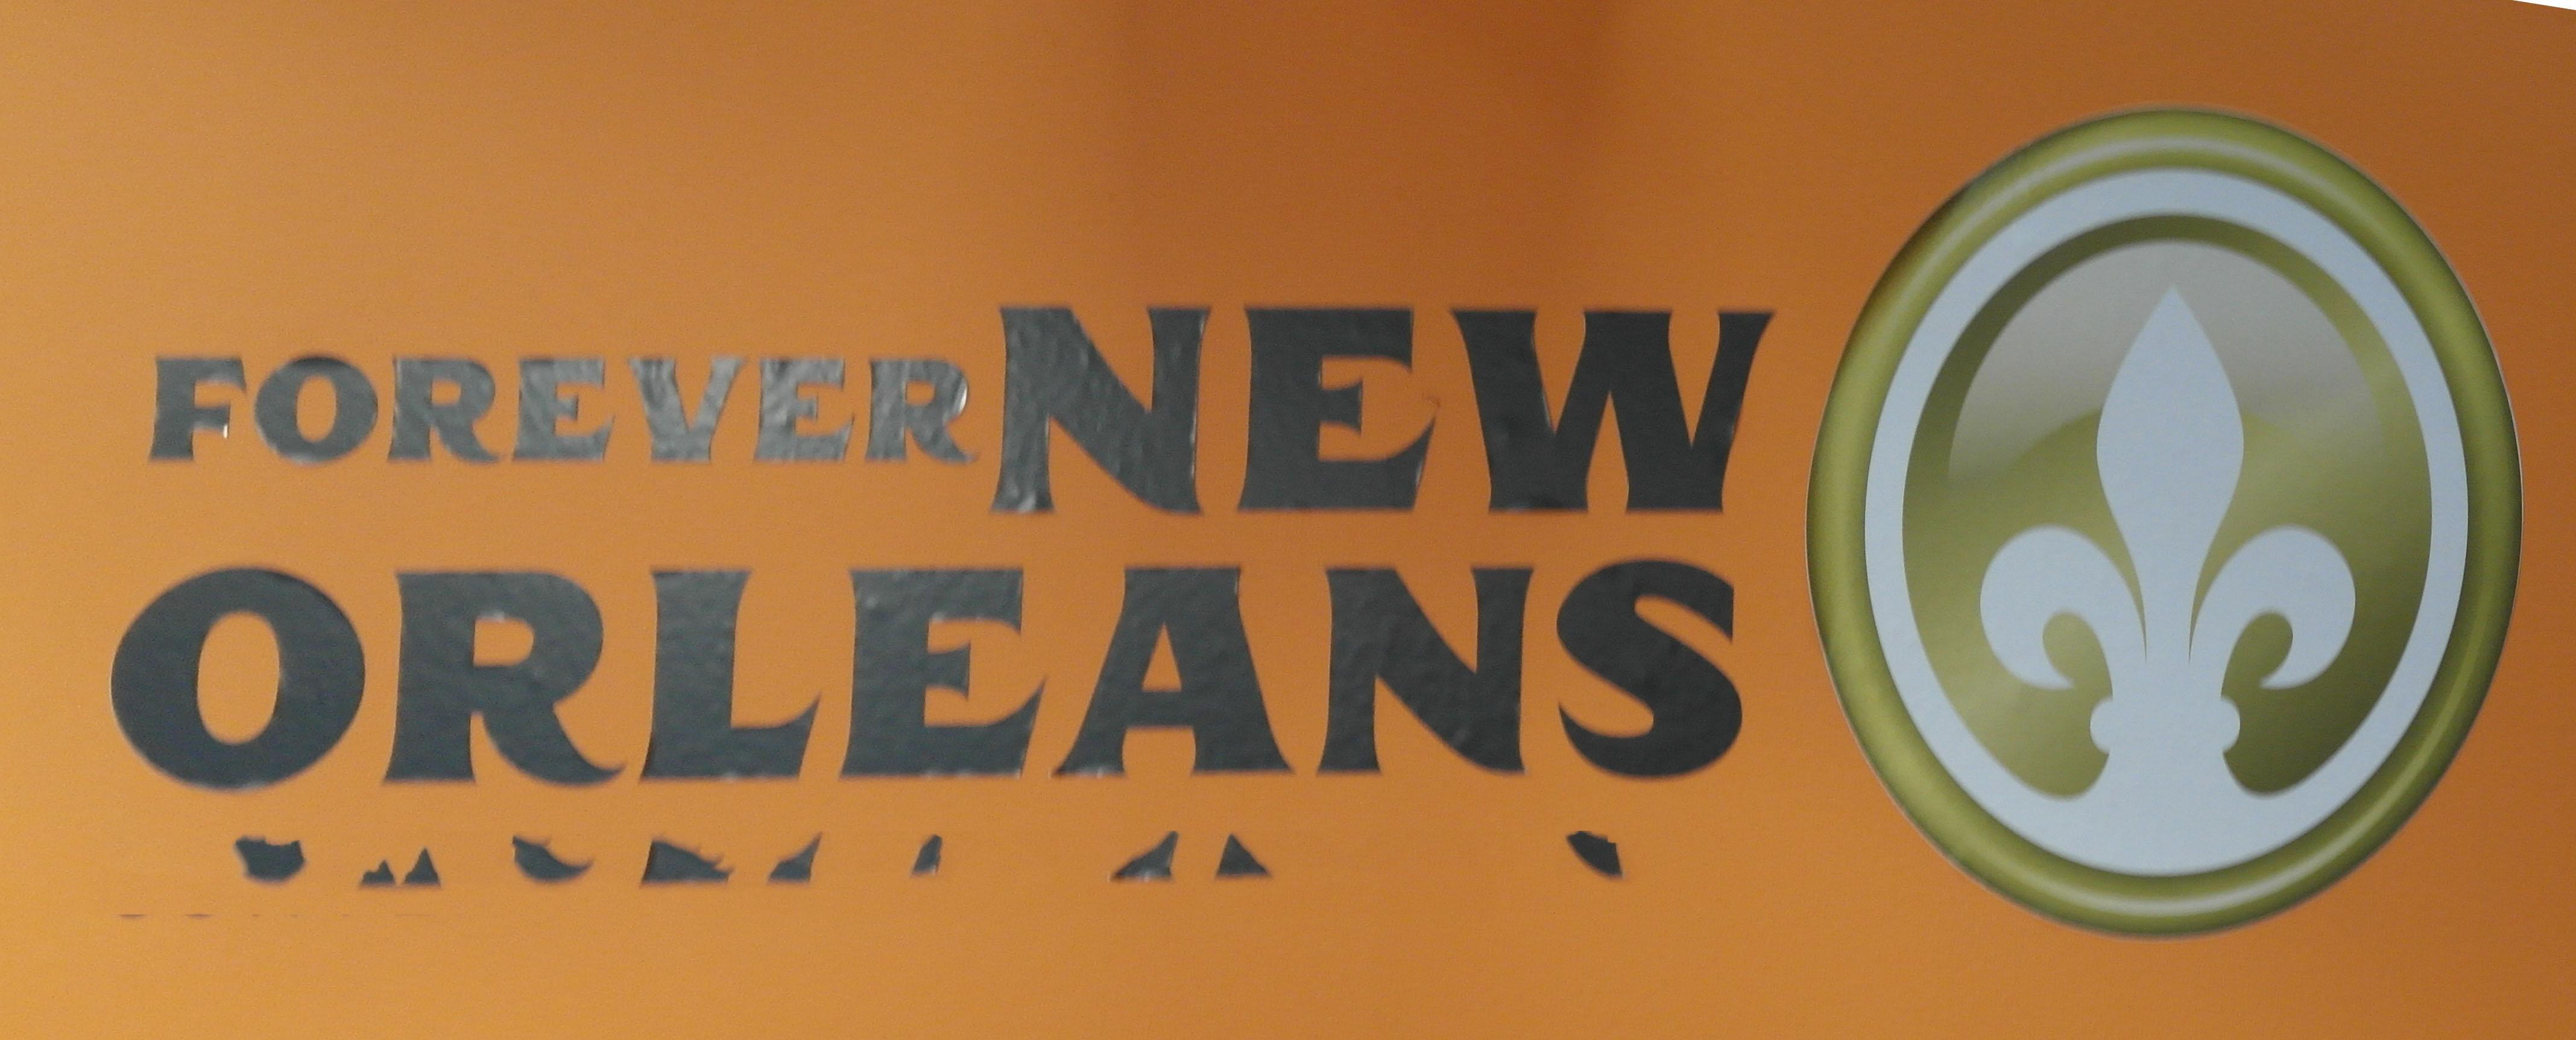 new_oreleans logo